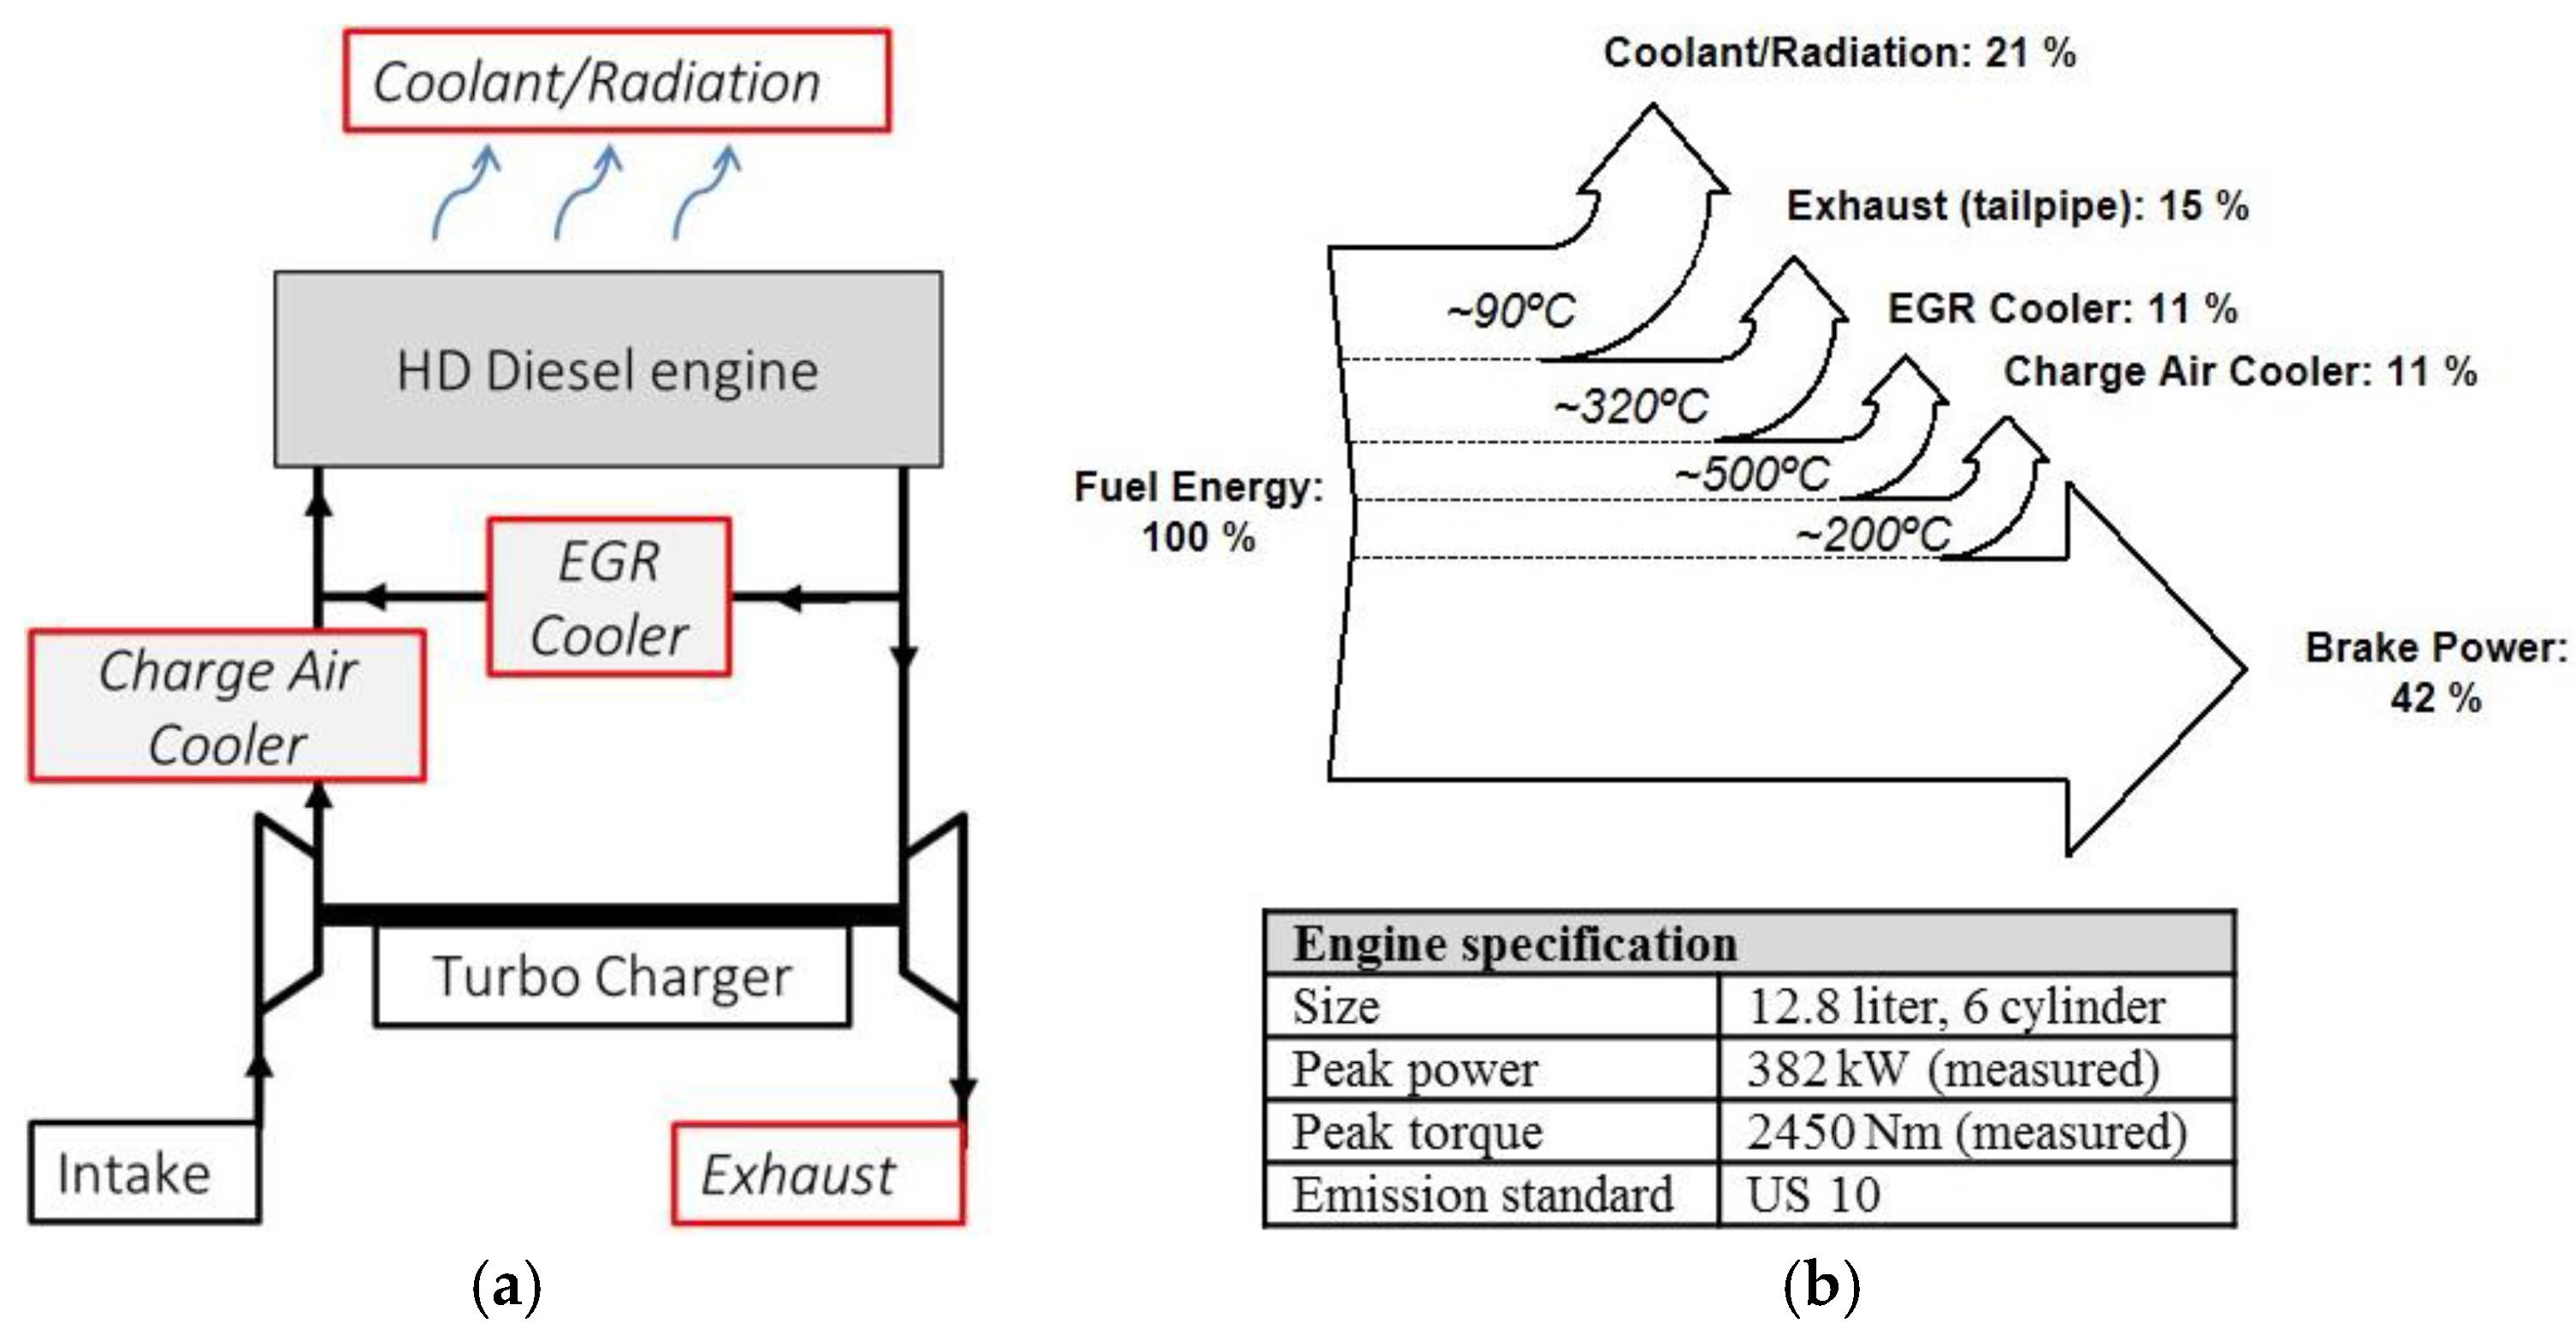 Combination Valve Diagram Energies Free Full Text Of Combination Valve Diagram